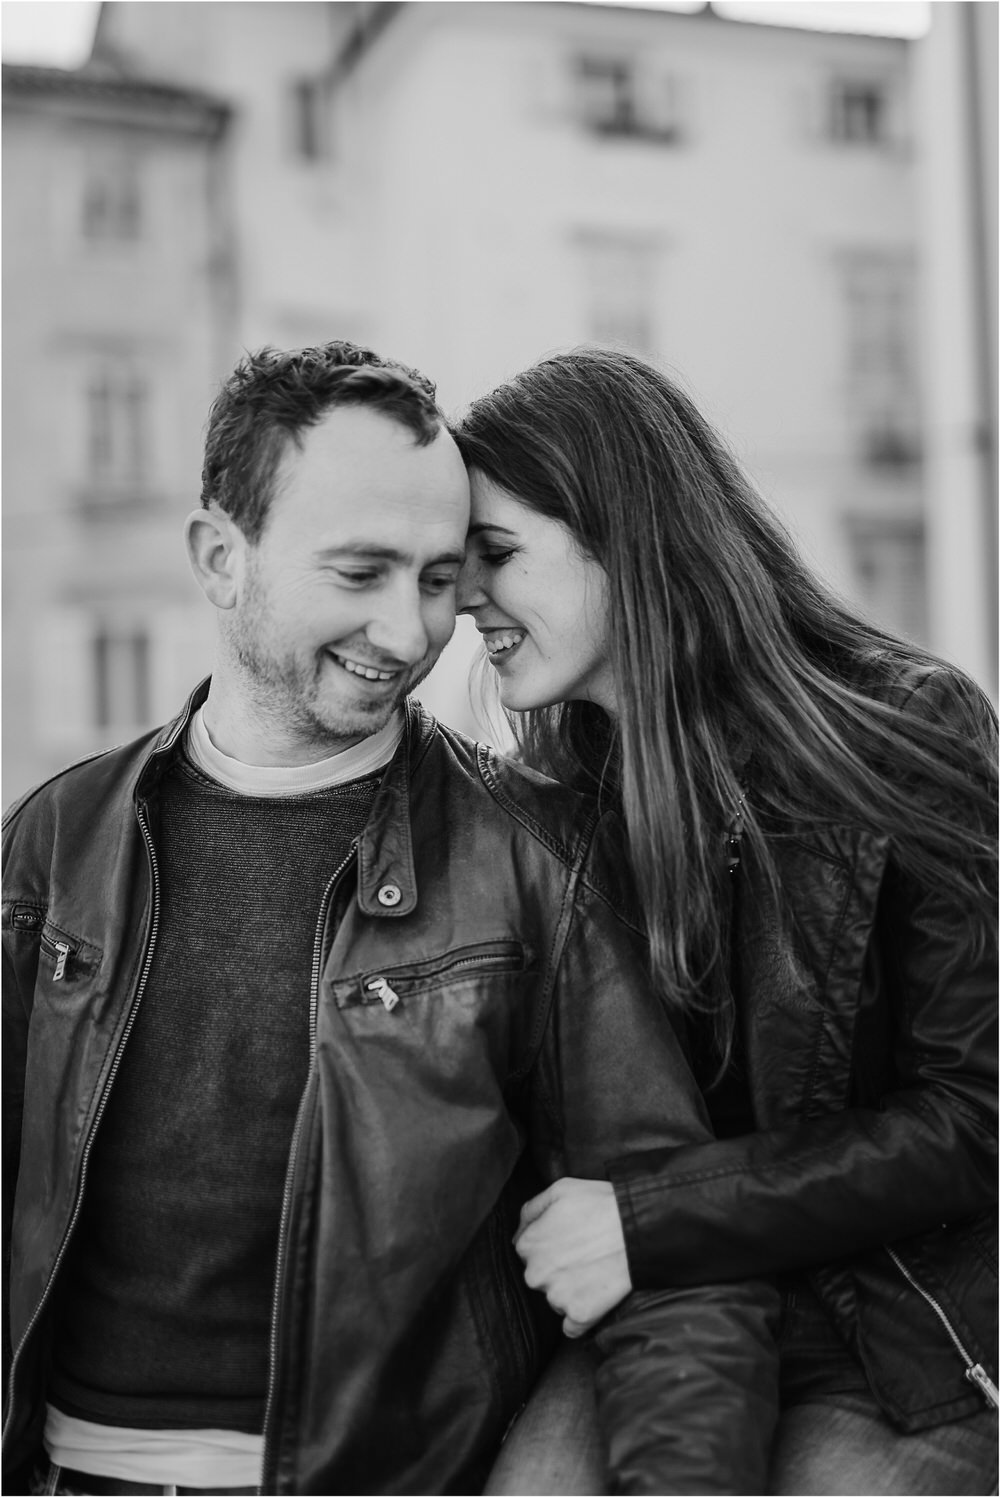 piran slovenia engagement phtoographer session photography slovenia seaside beach wedding elopement 0019.jpg